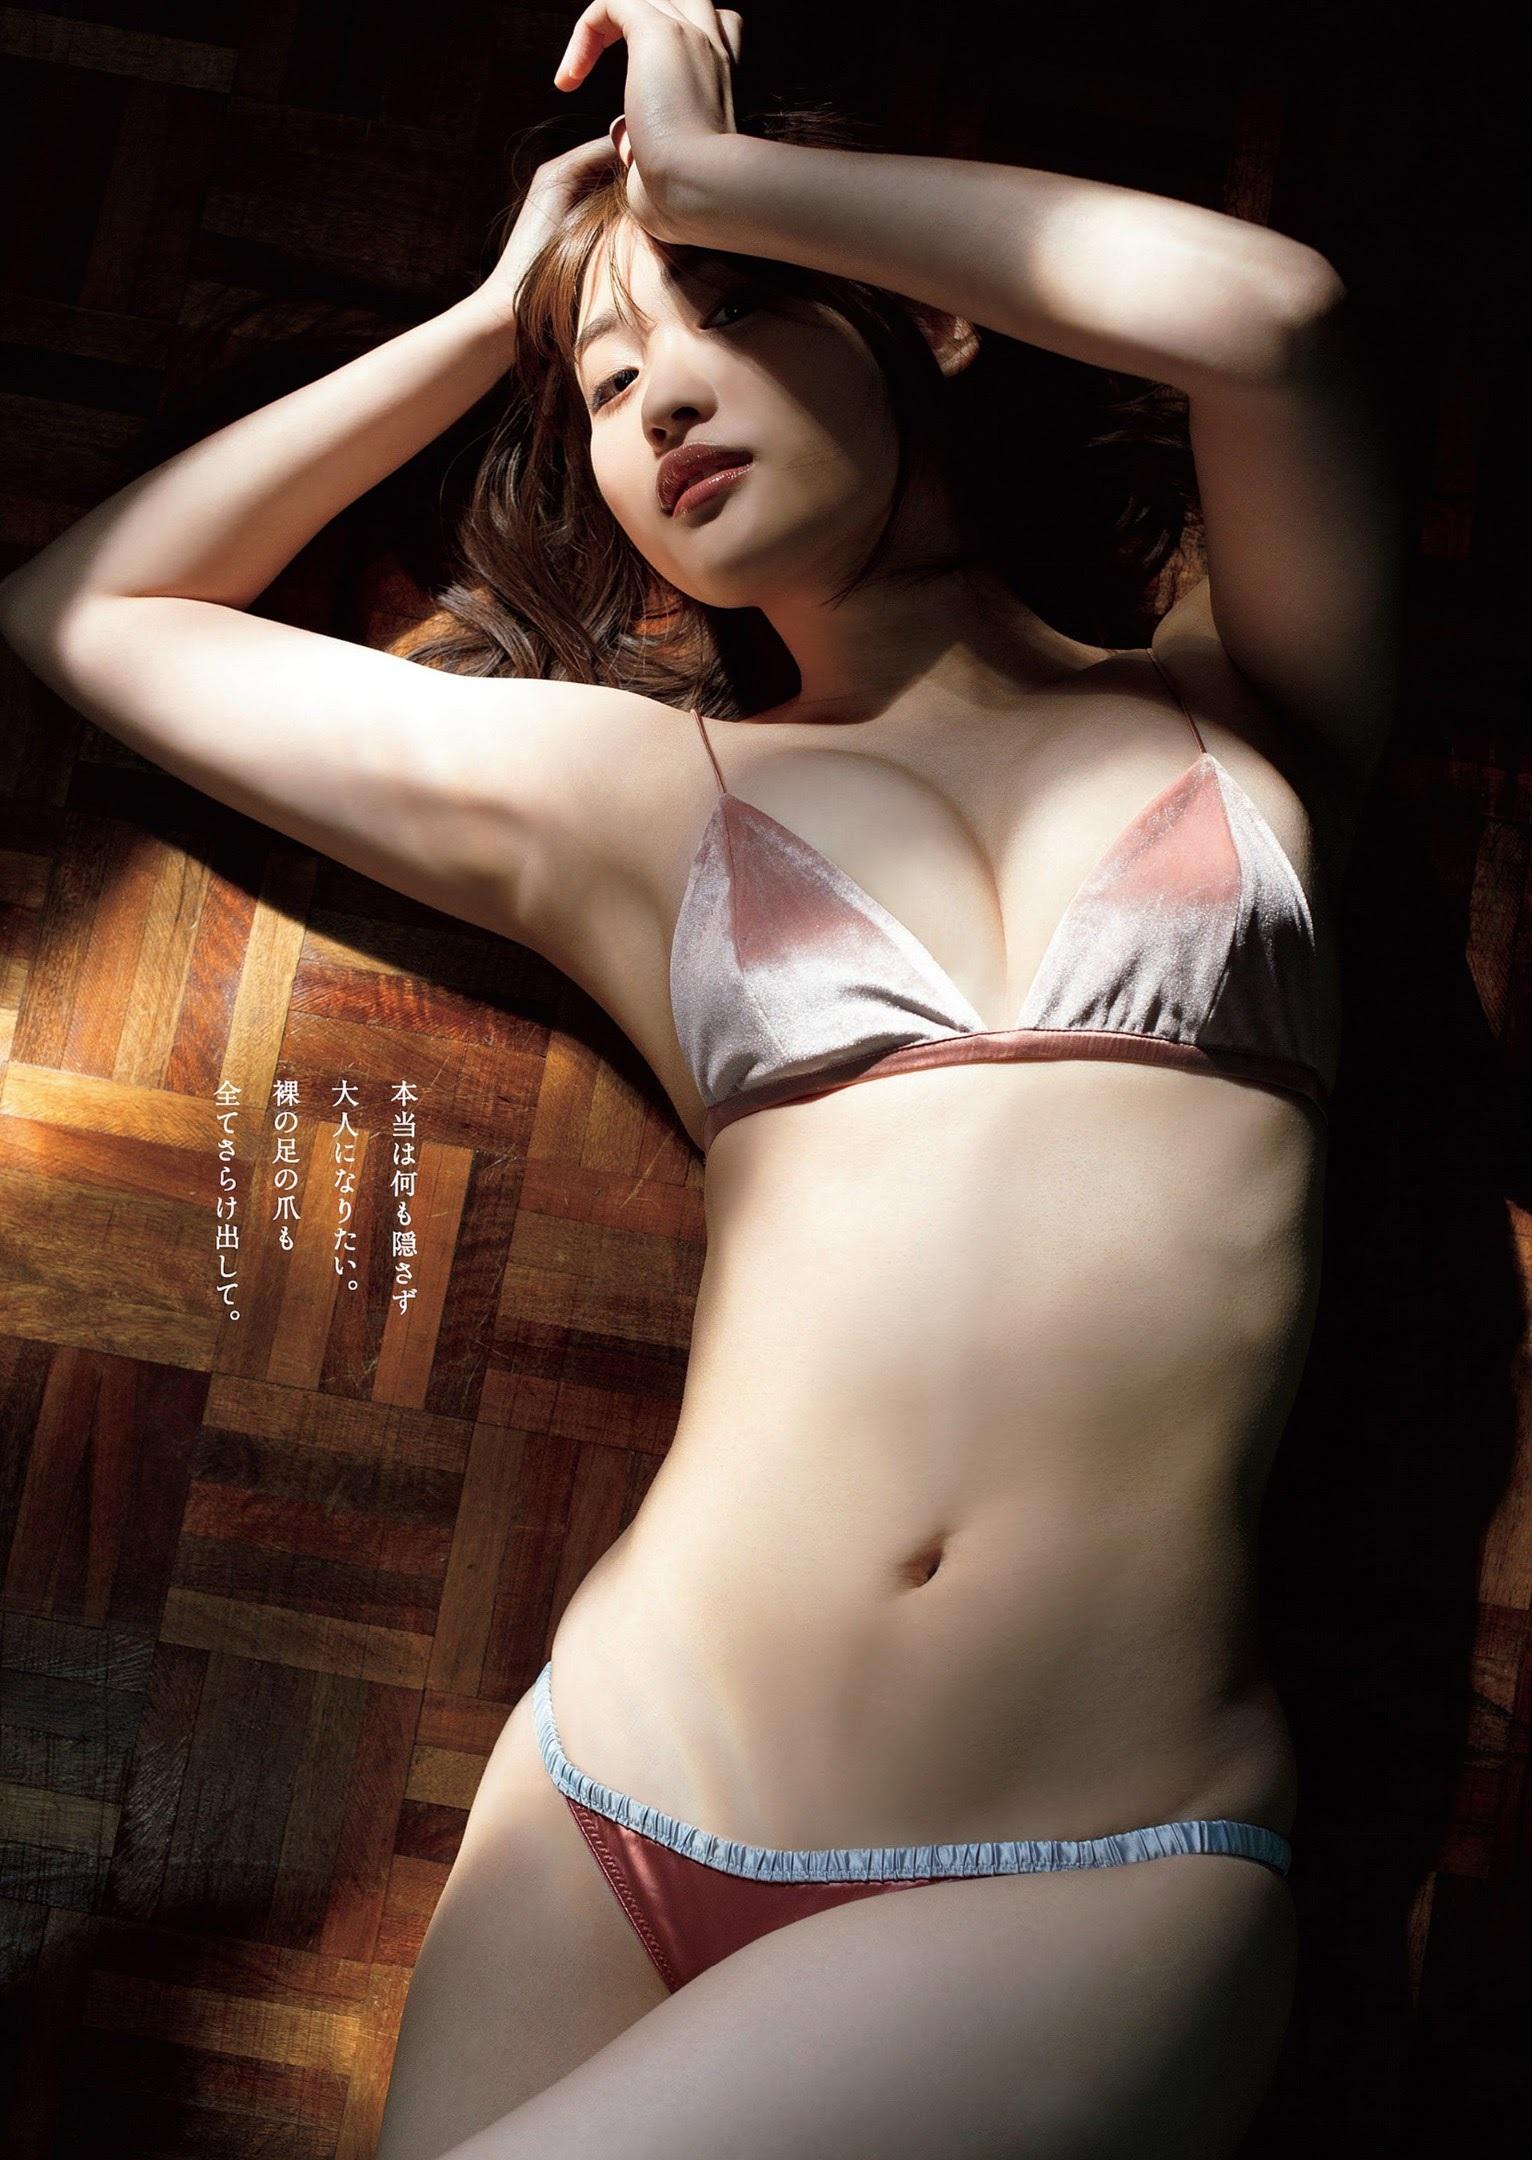 小山璃奈 頓知気さきな 伊藤美来-Weekly Playboy 2021年第十八期 高清套图 第36张